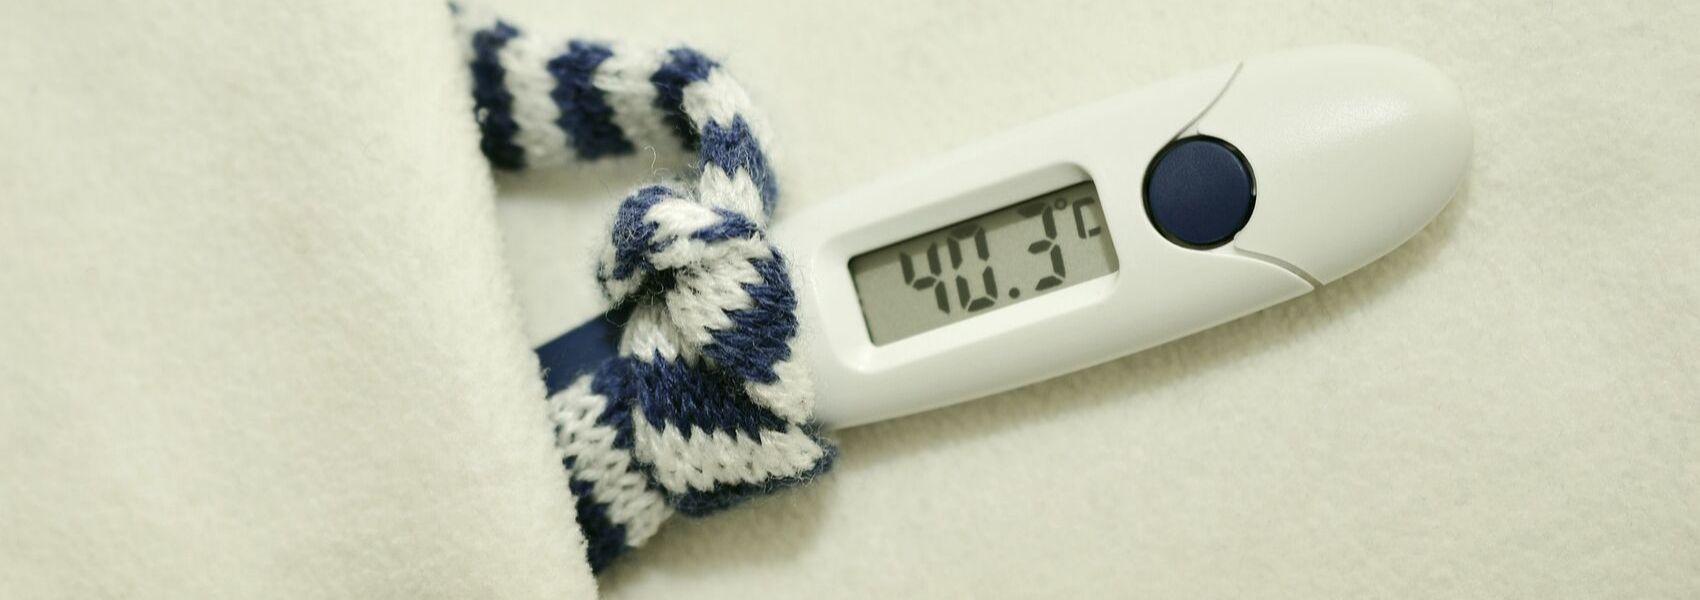 alimentos a evitar na gripe